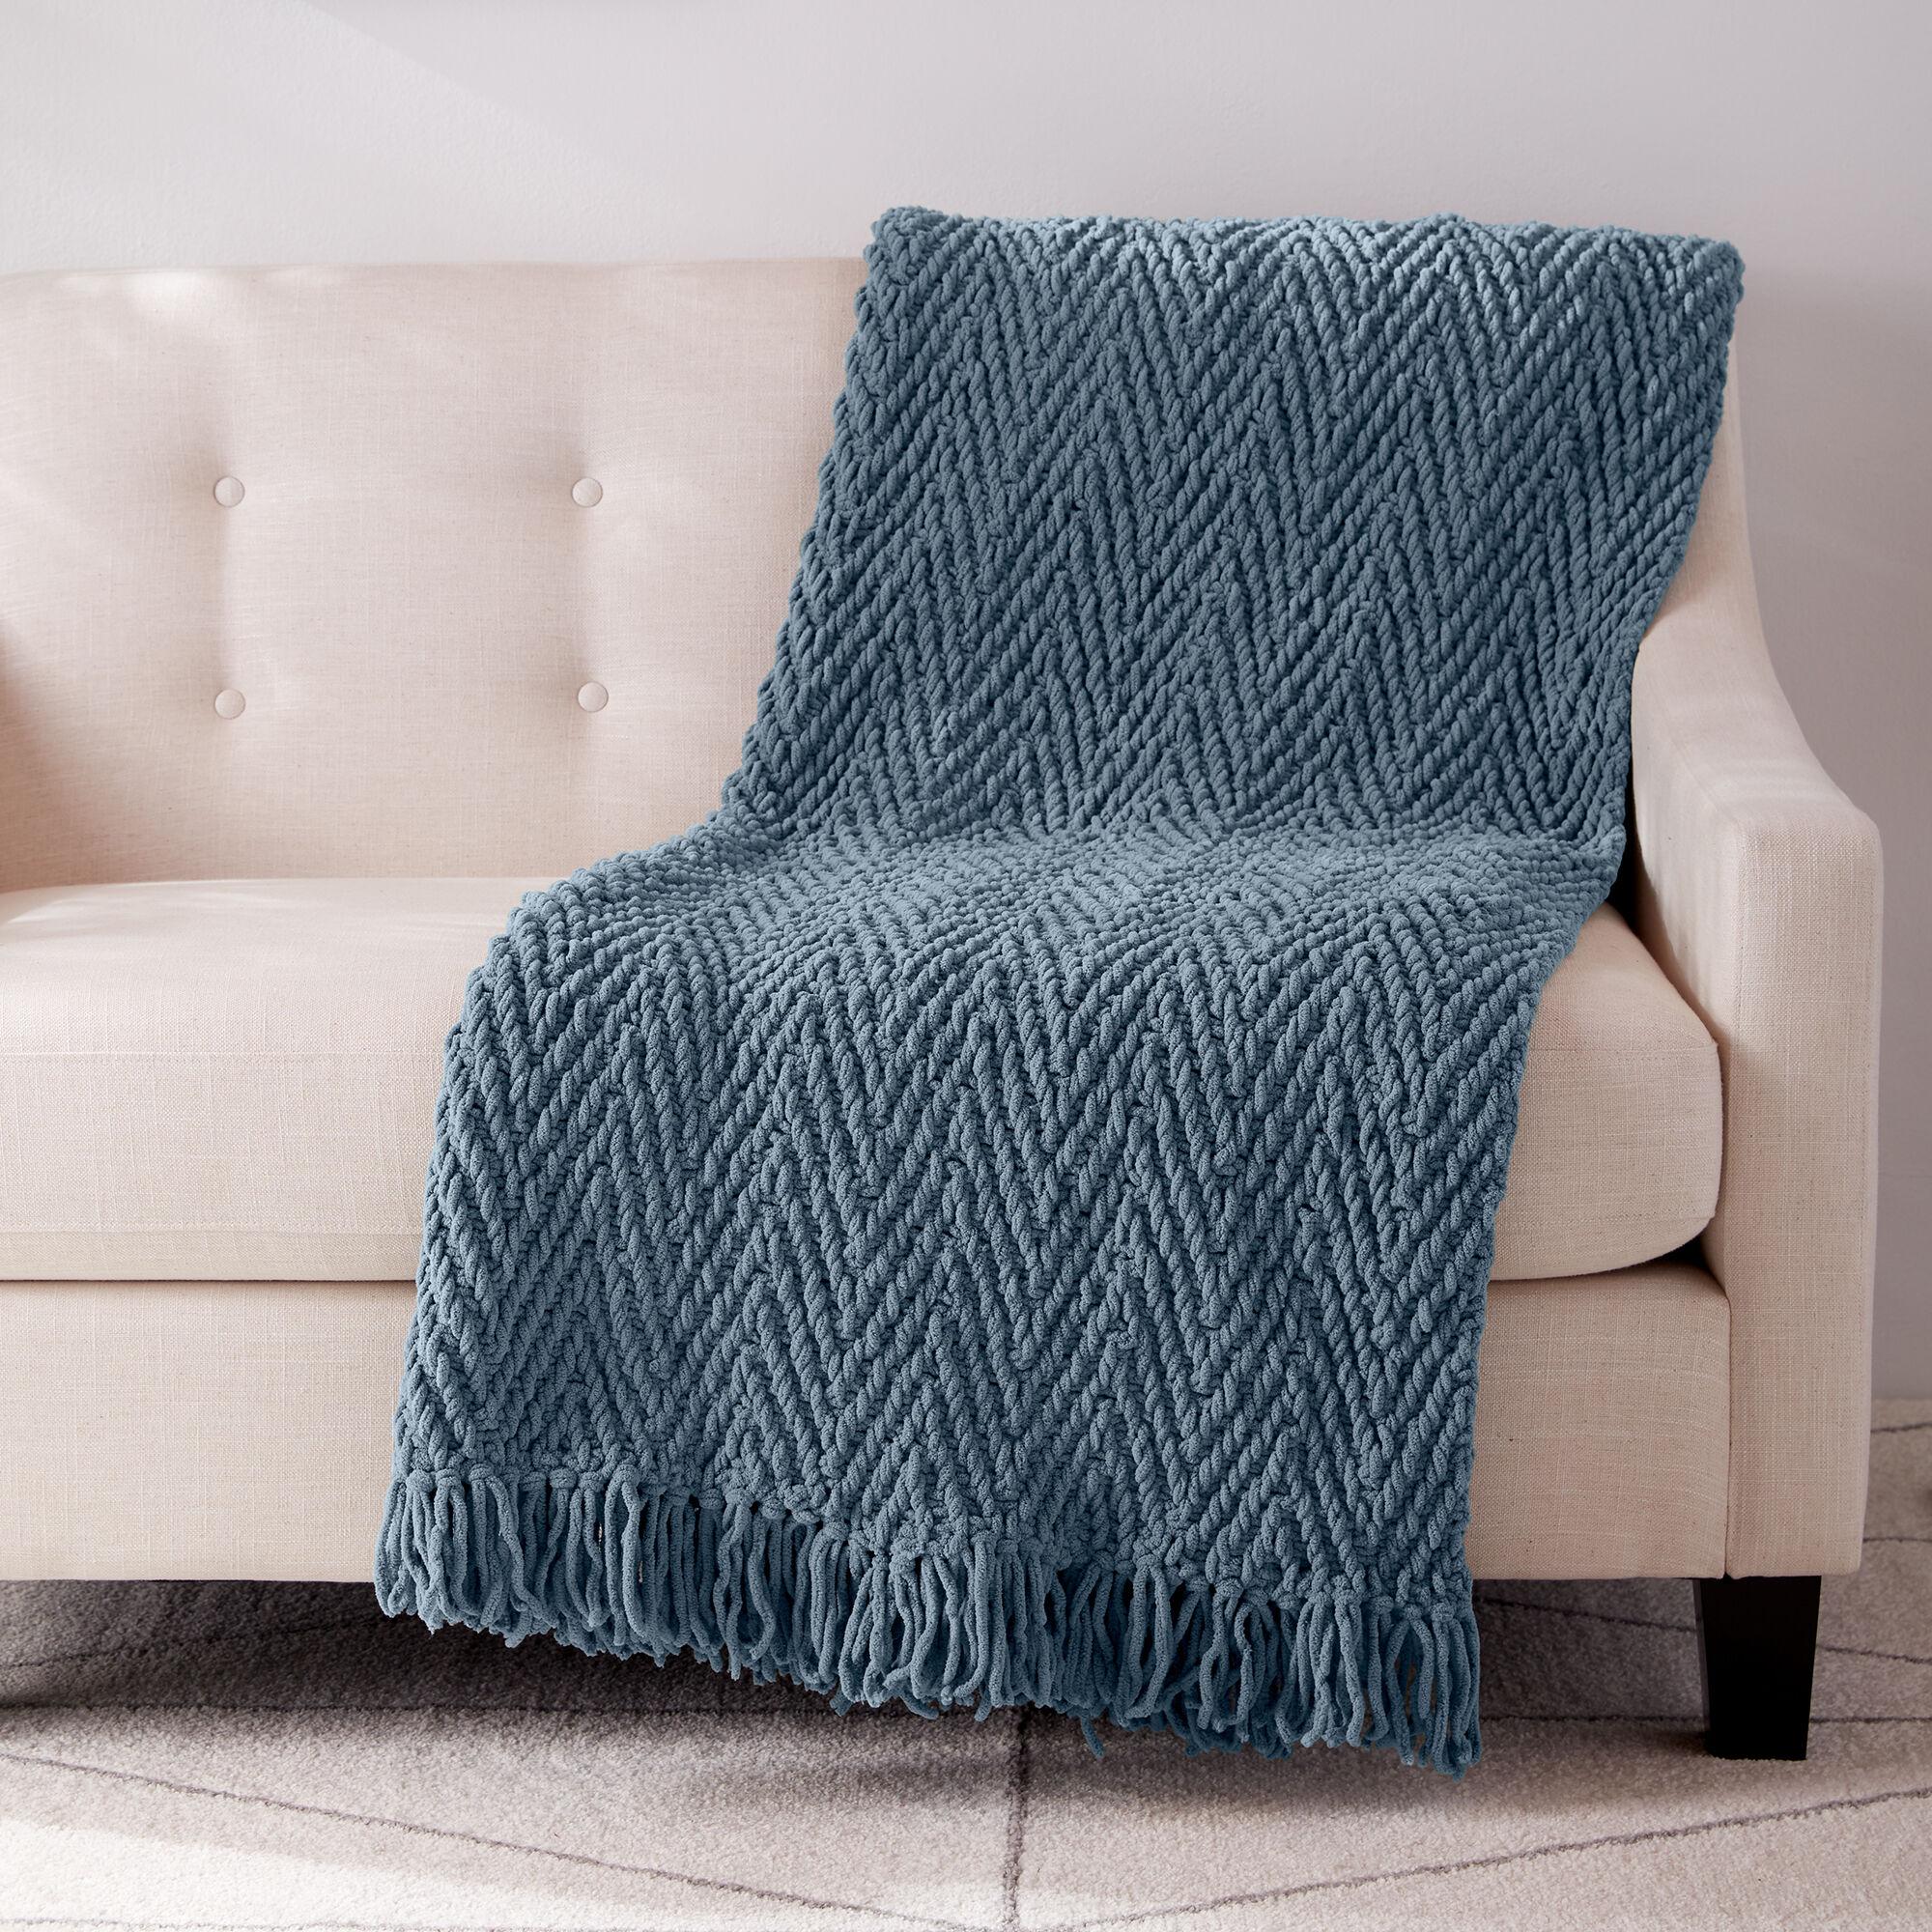 Bernat Herringbone Weave Knit Blanket Pattern   Yarnspirations